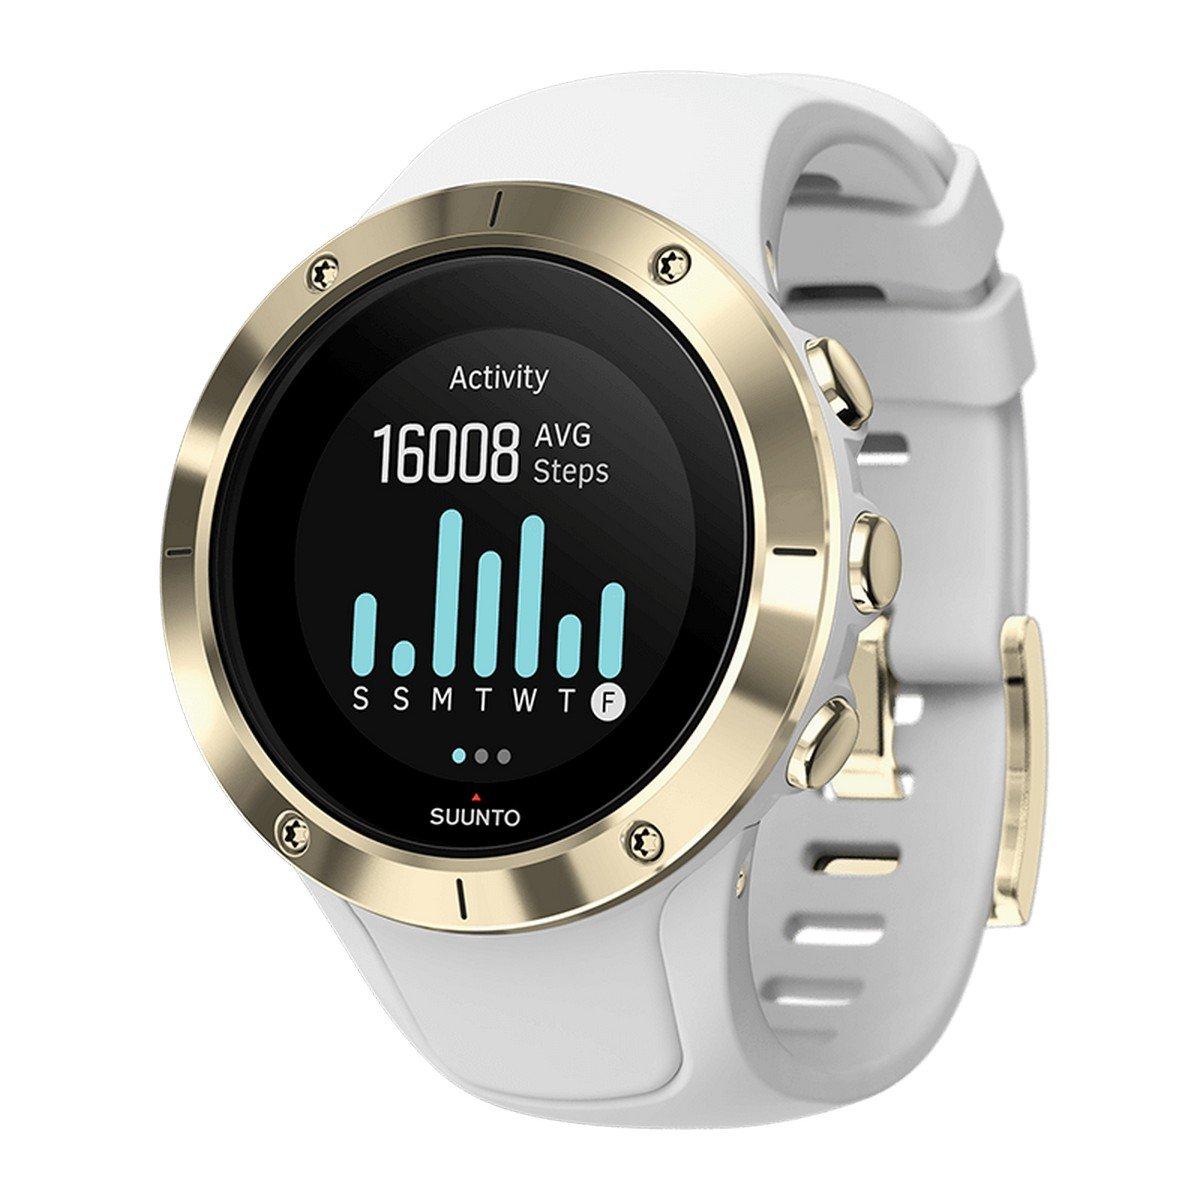 Suunto Spartan Trainer Wrist HR Multisport GPS Watch (Gold) by Suunto (Image #2)